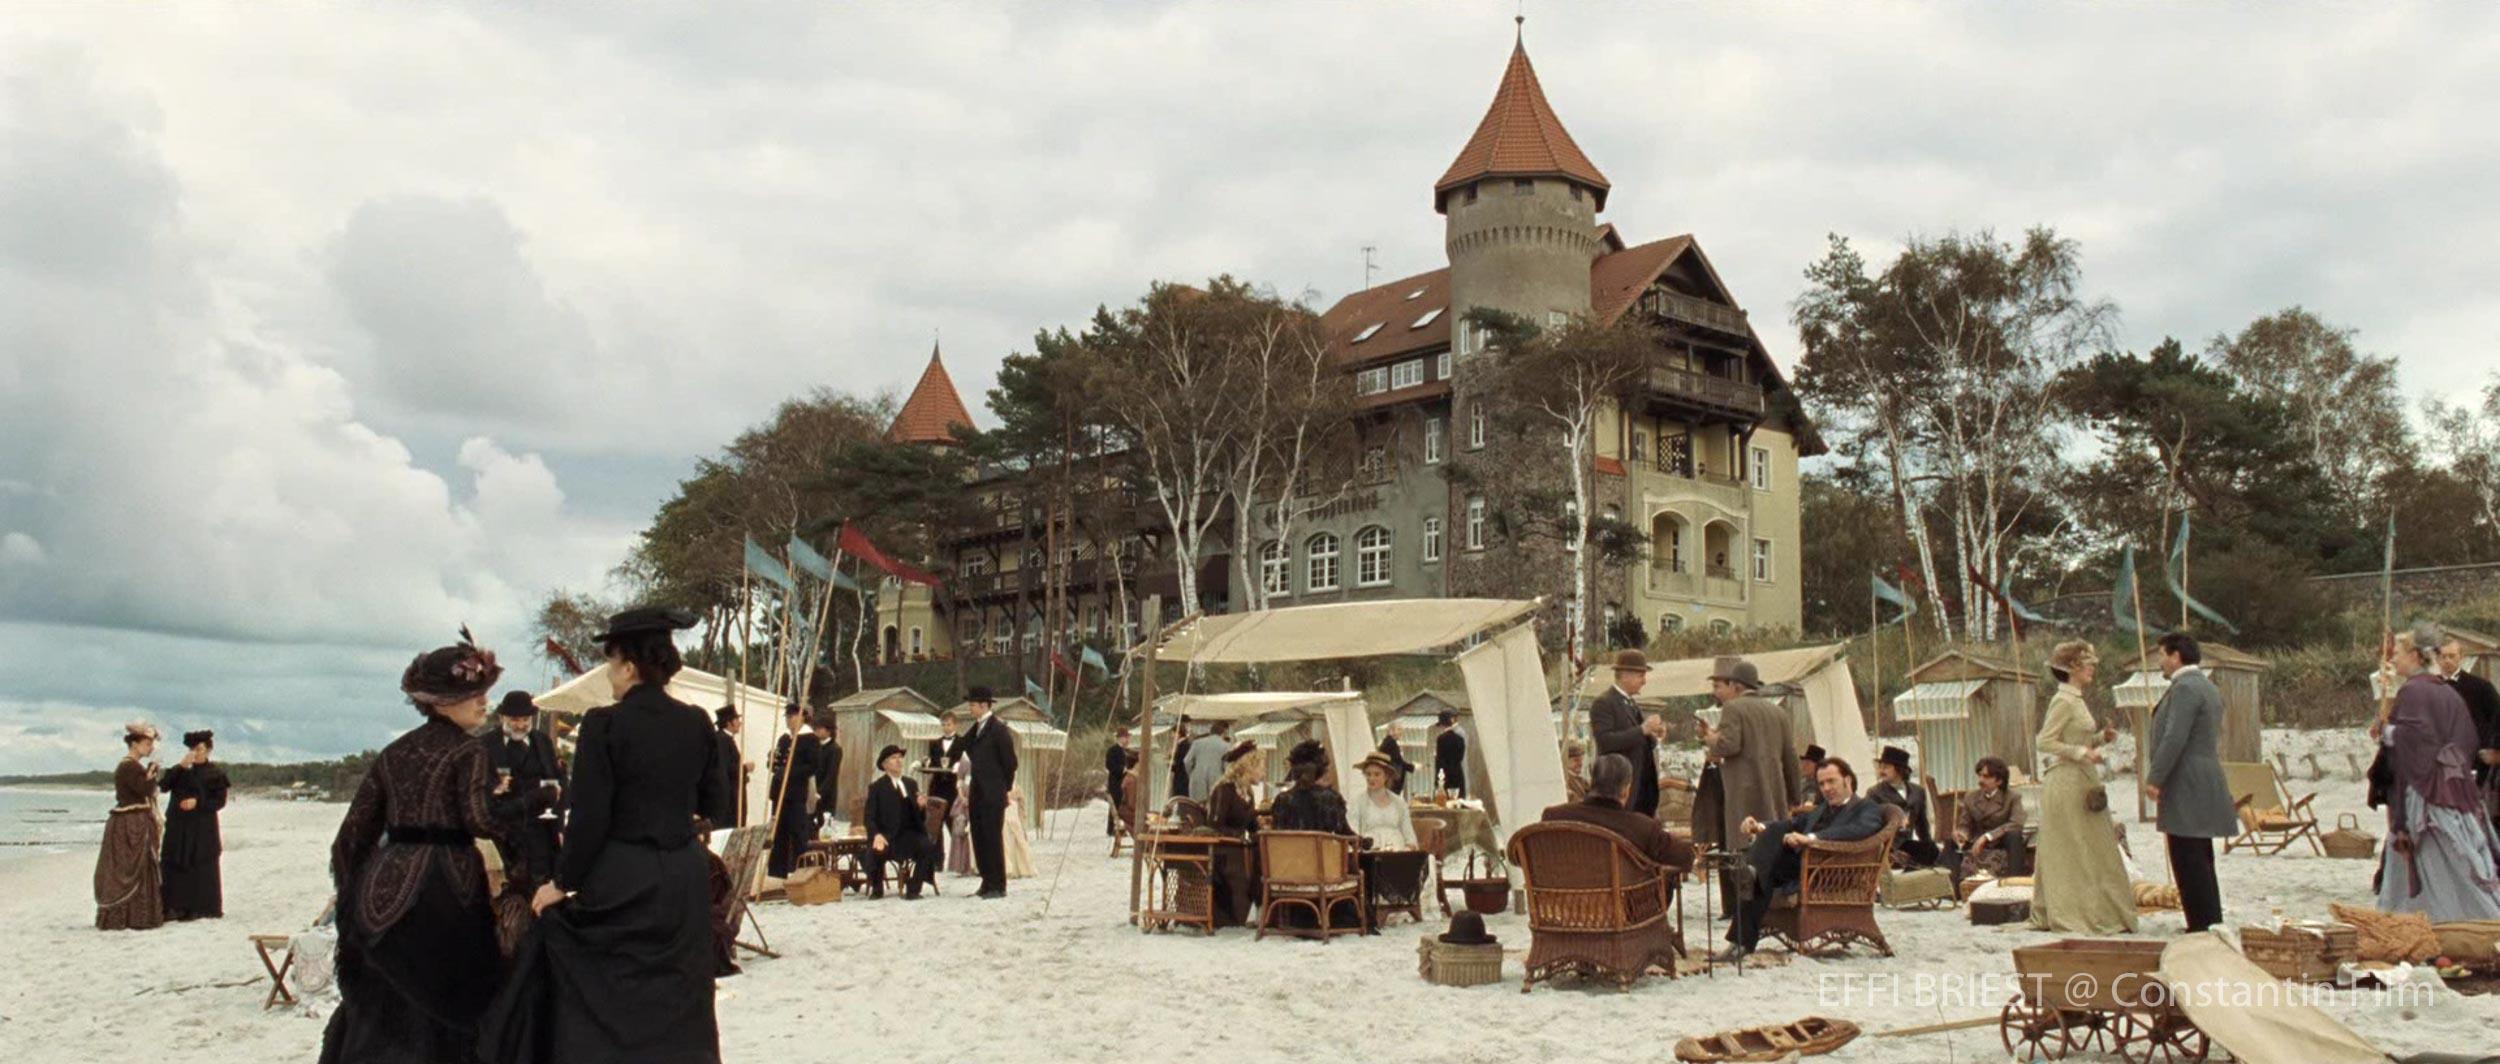 Effi Briest Regie Hermine Huntgeburth Julia Jentsch Filmset Thomas Freudenthal Production Design Szenenbild Hamburg Germany